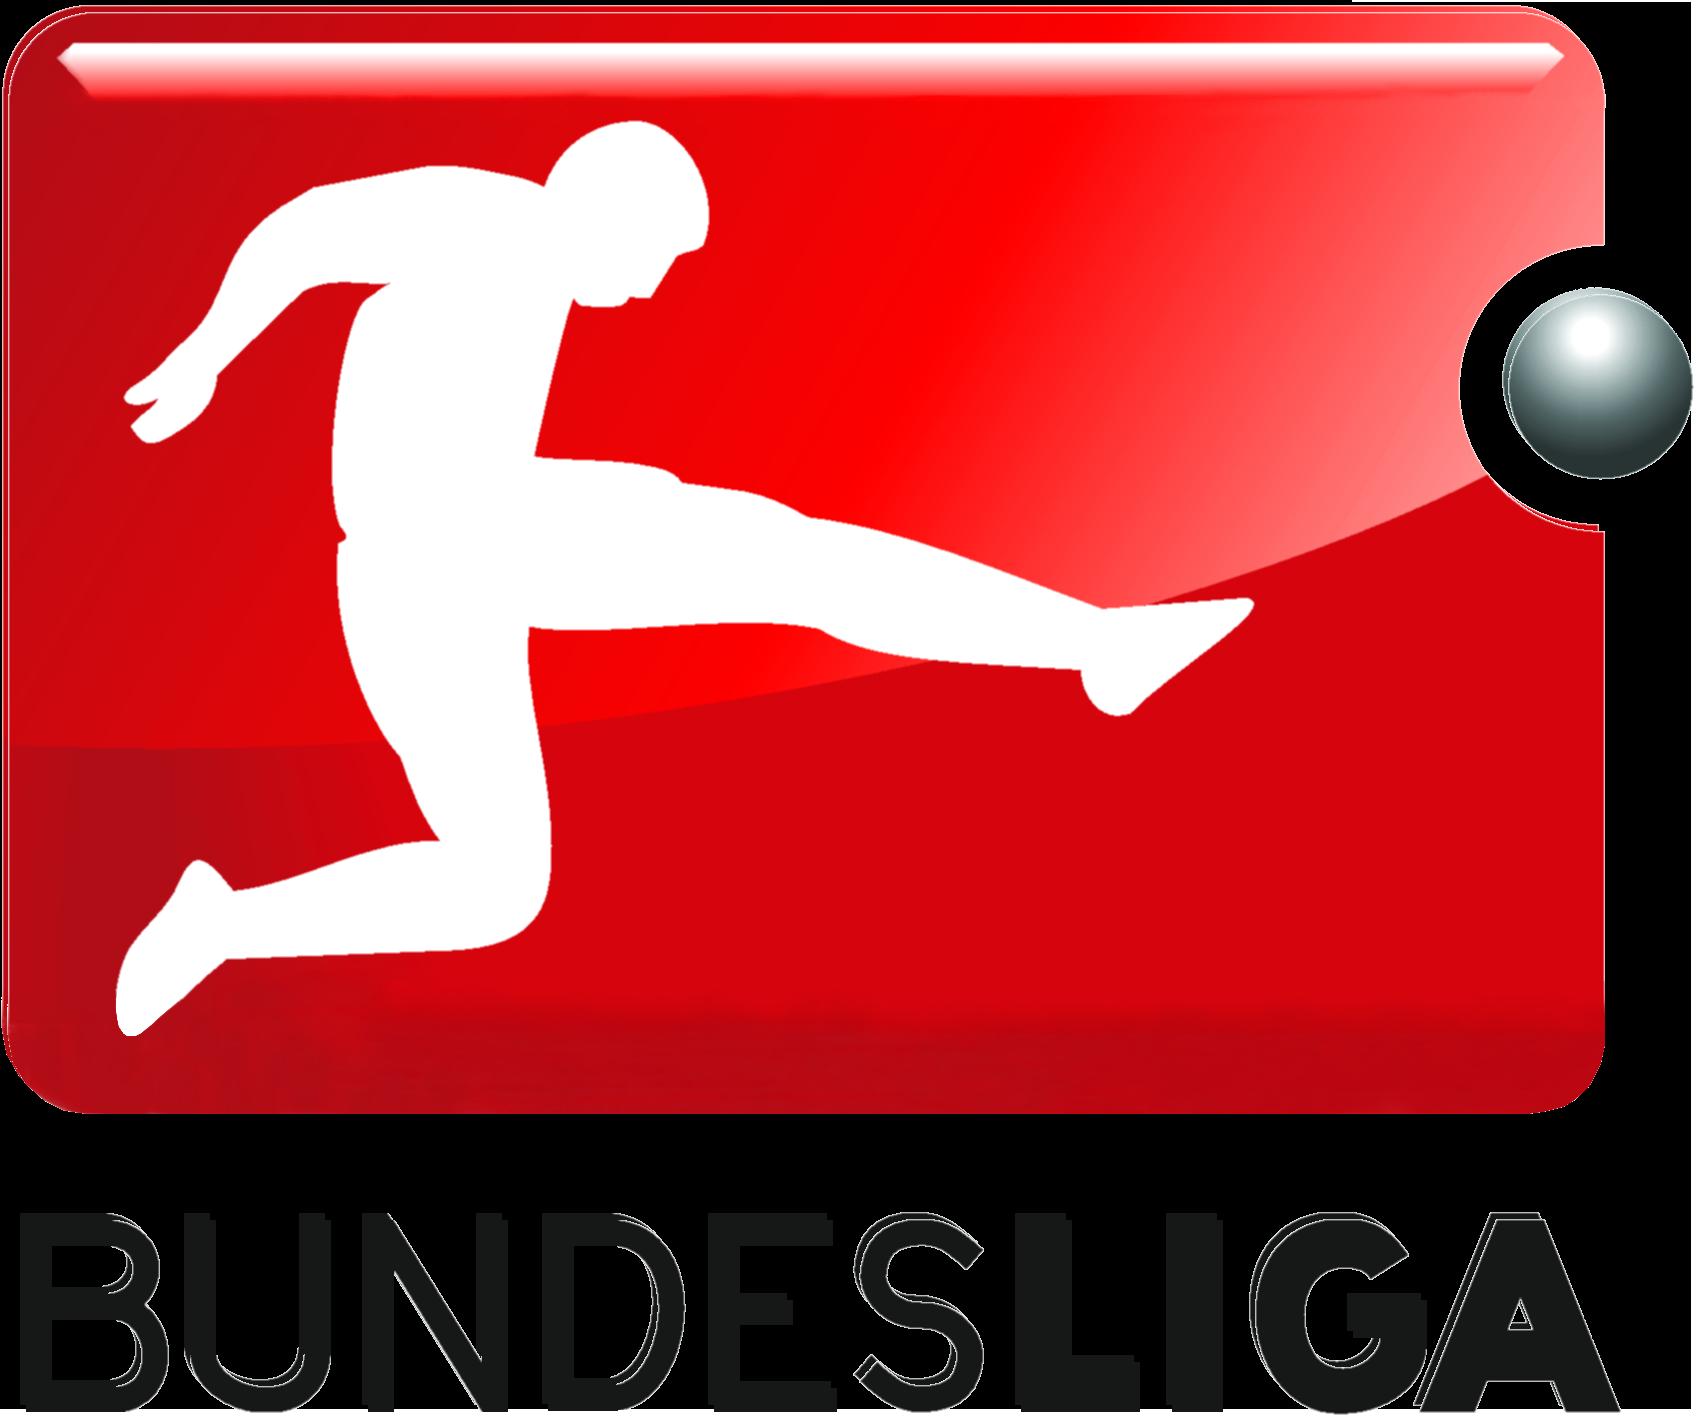 fussball 3 bundesliga ergebnisse